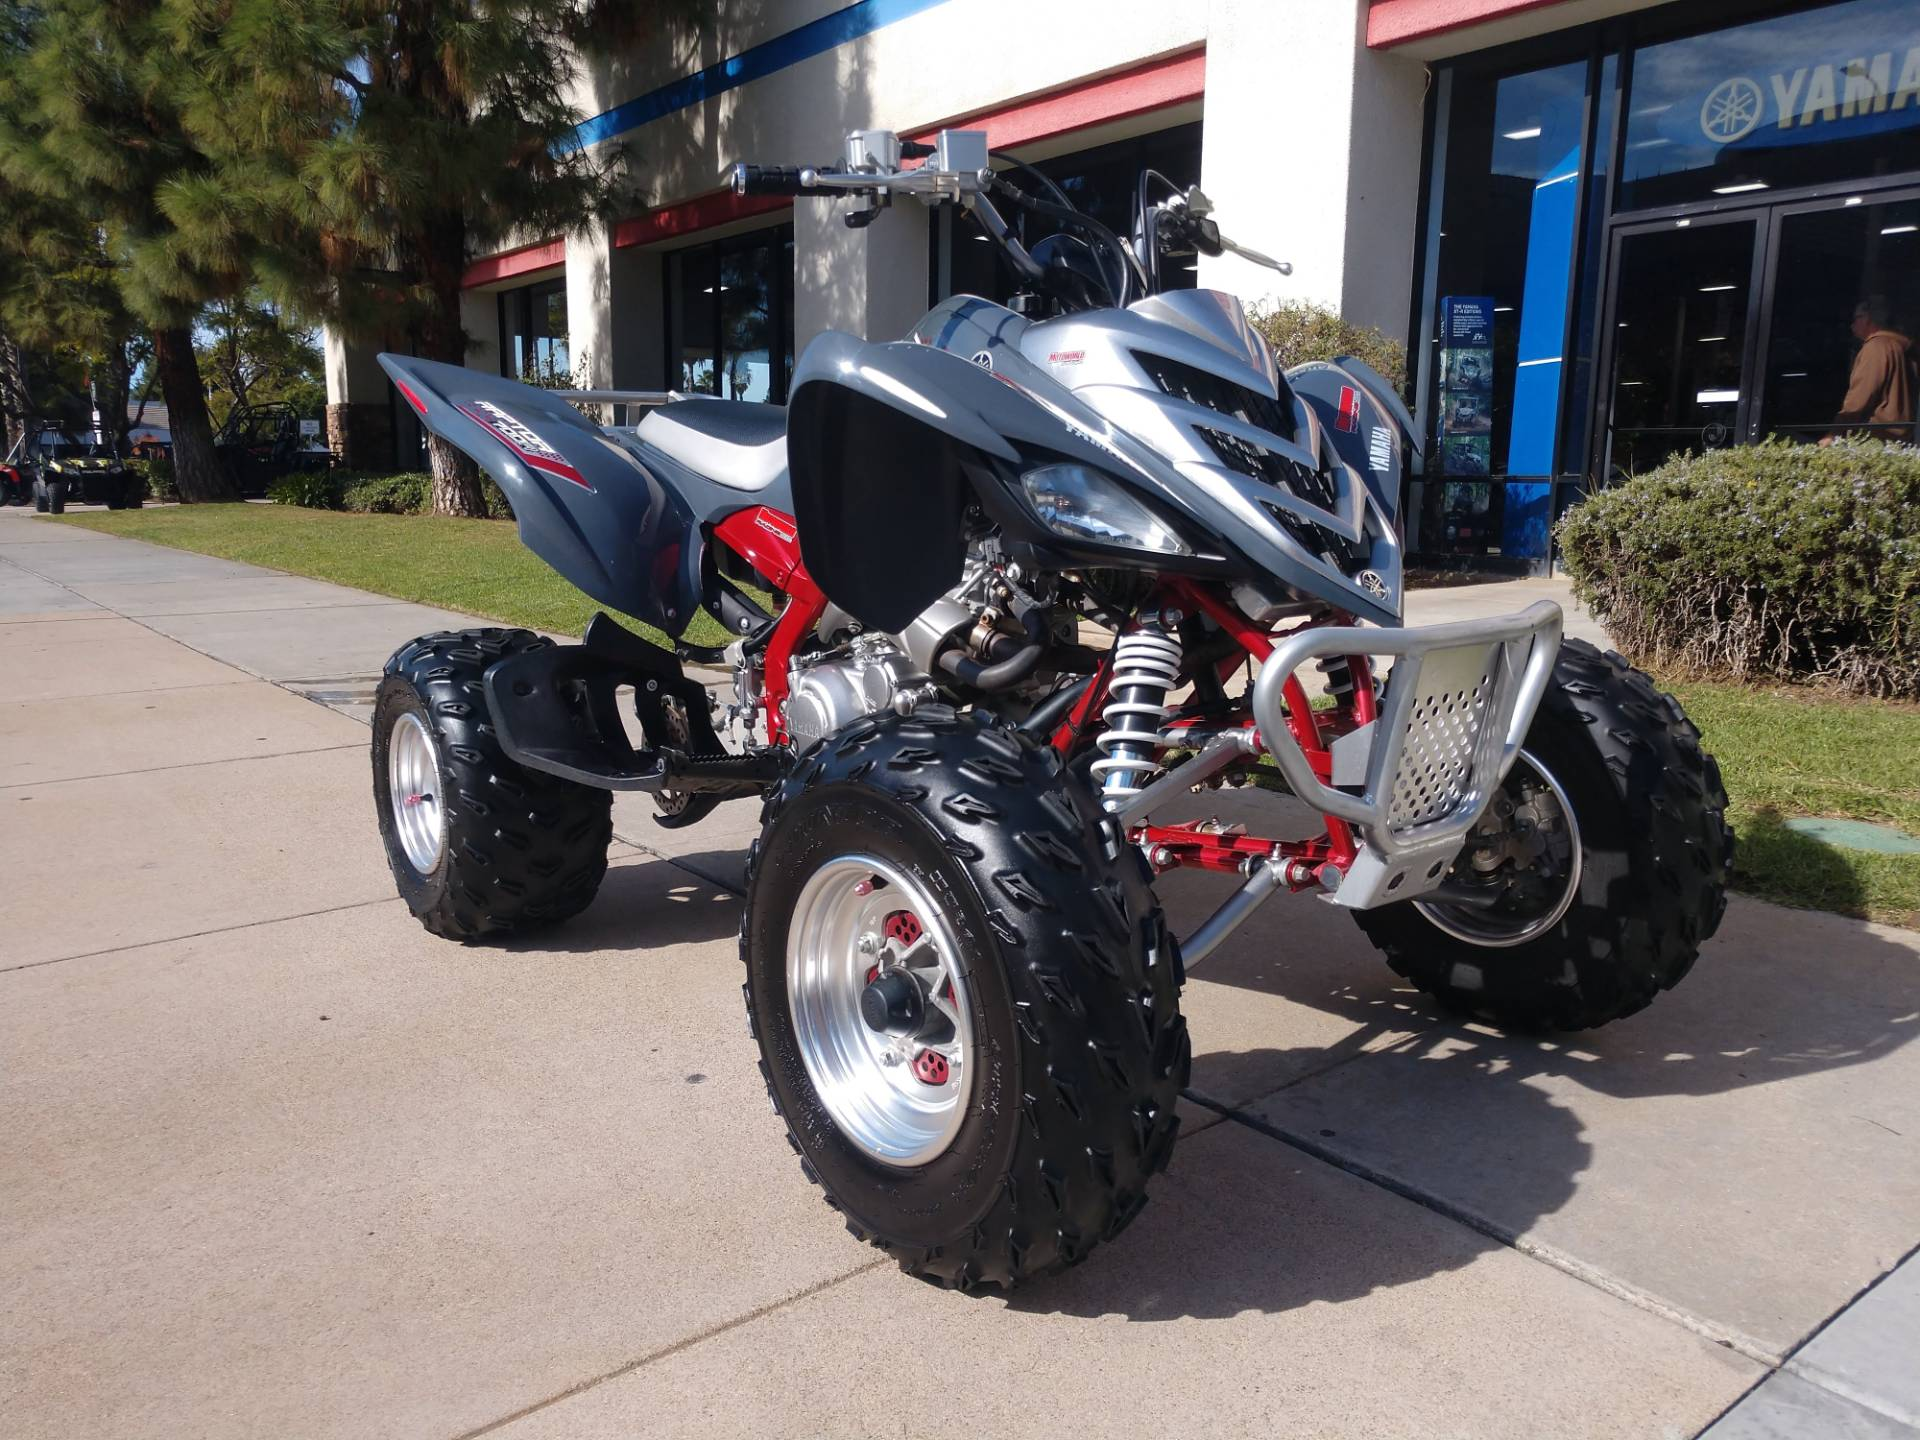 2007 Yamaha Raptor 700R 2